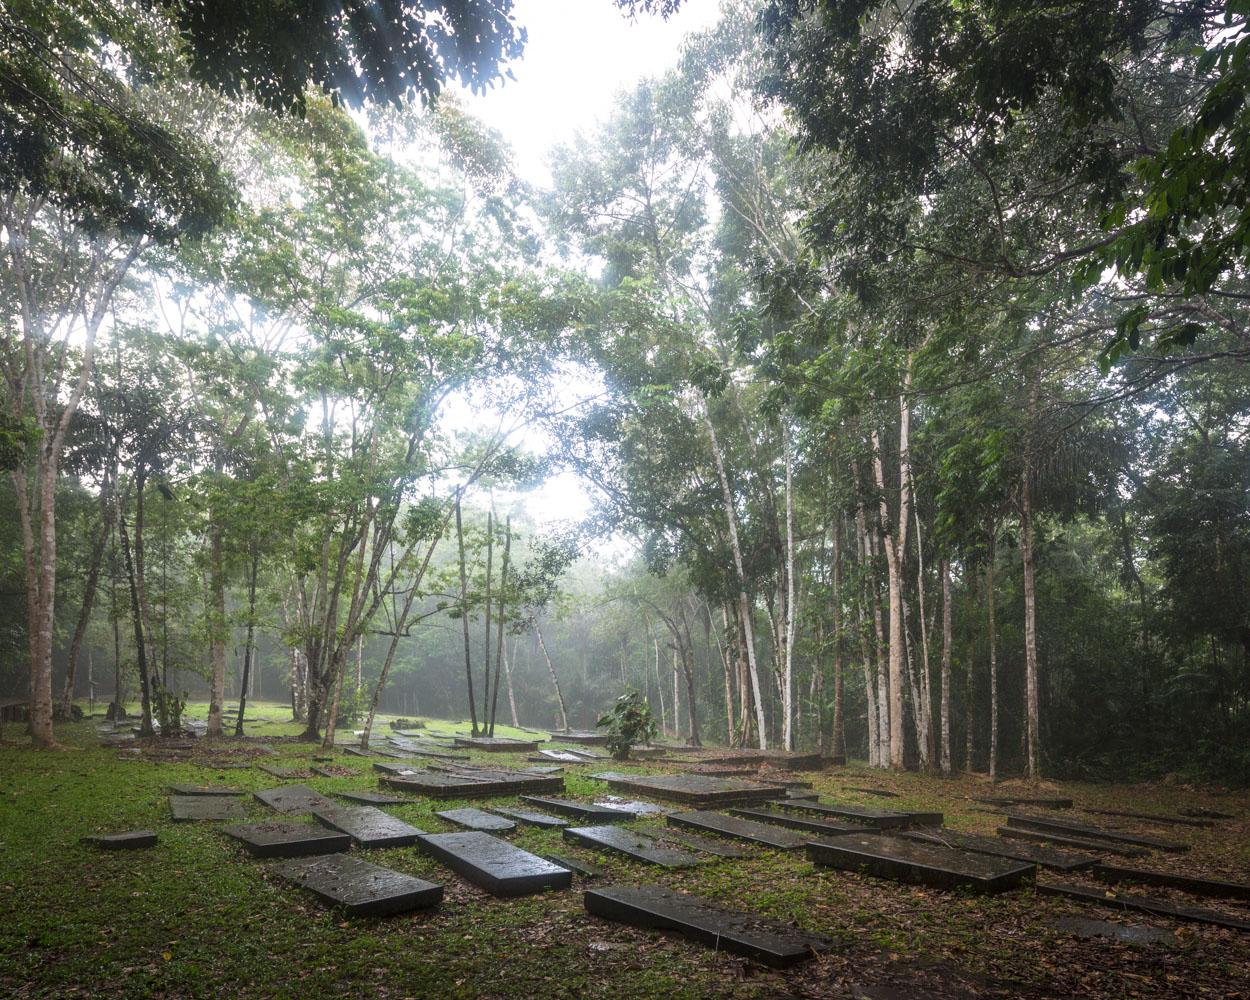 Jodensavanne Cemetery